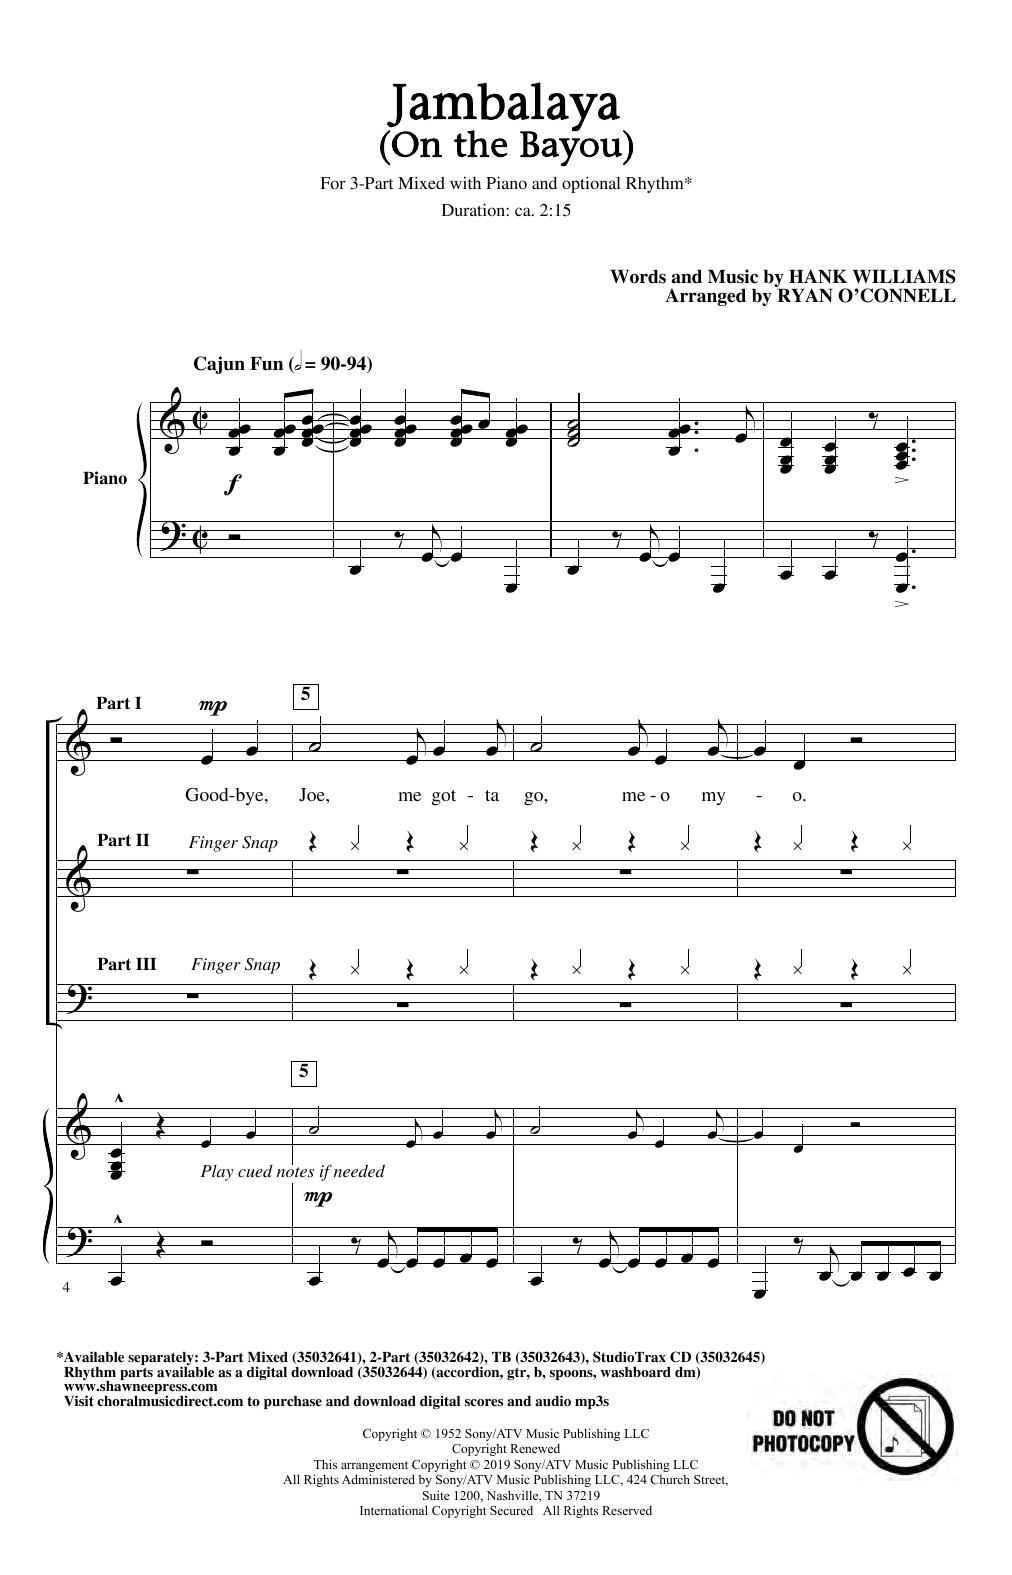 Jambalaya (On The Bayou) (arr. Ryan O'Connell) Sheet Music